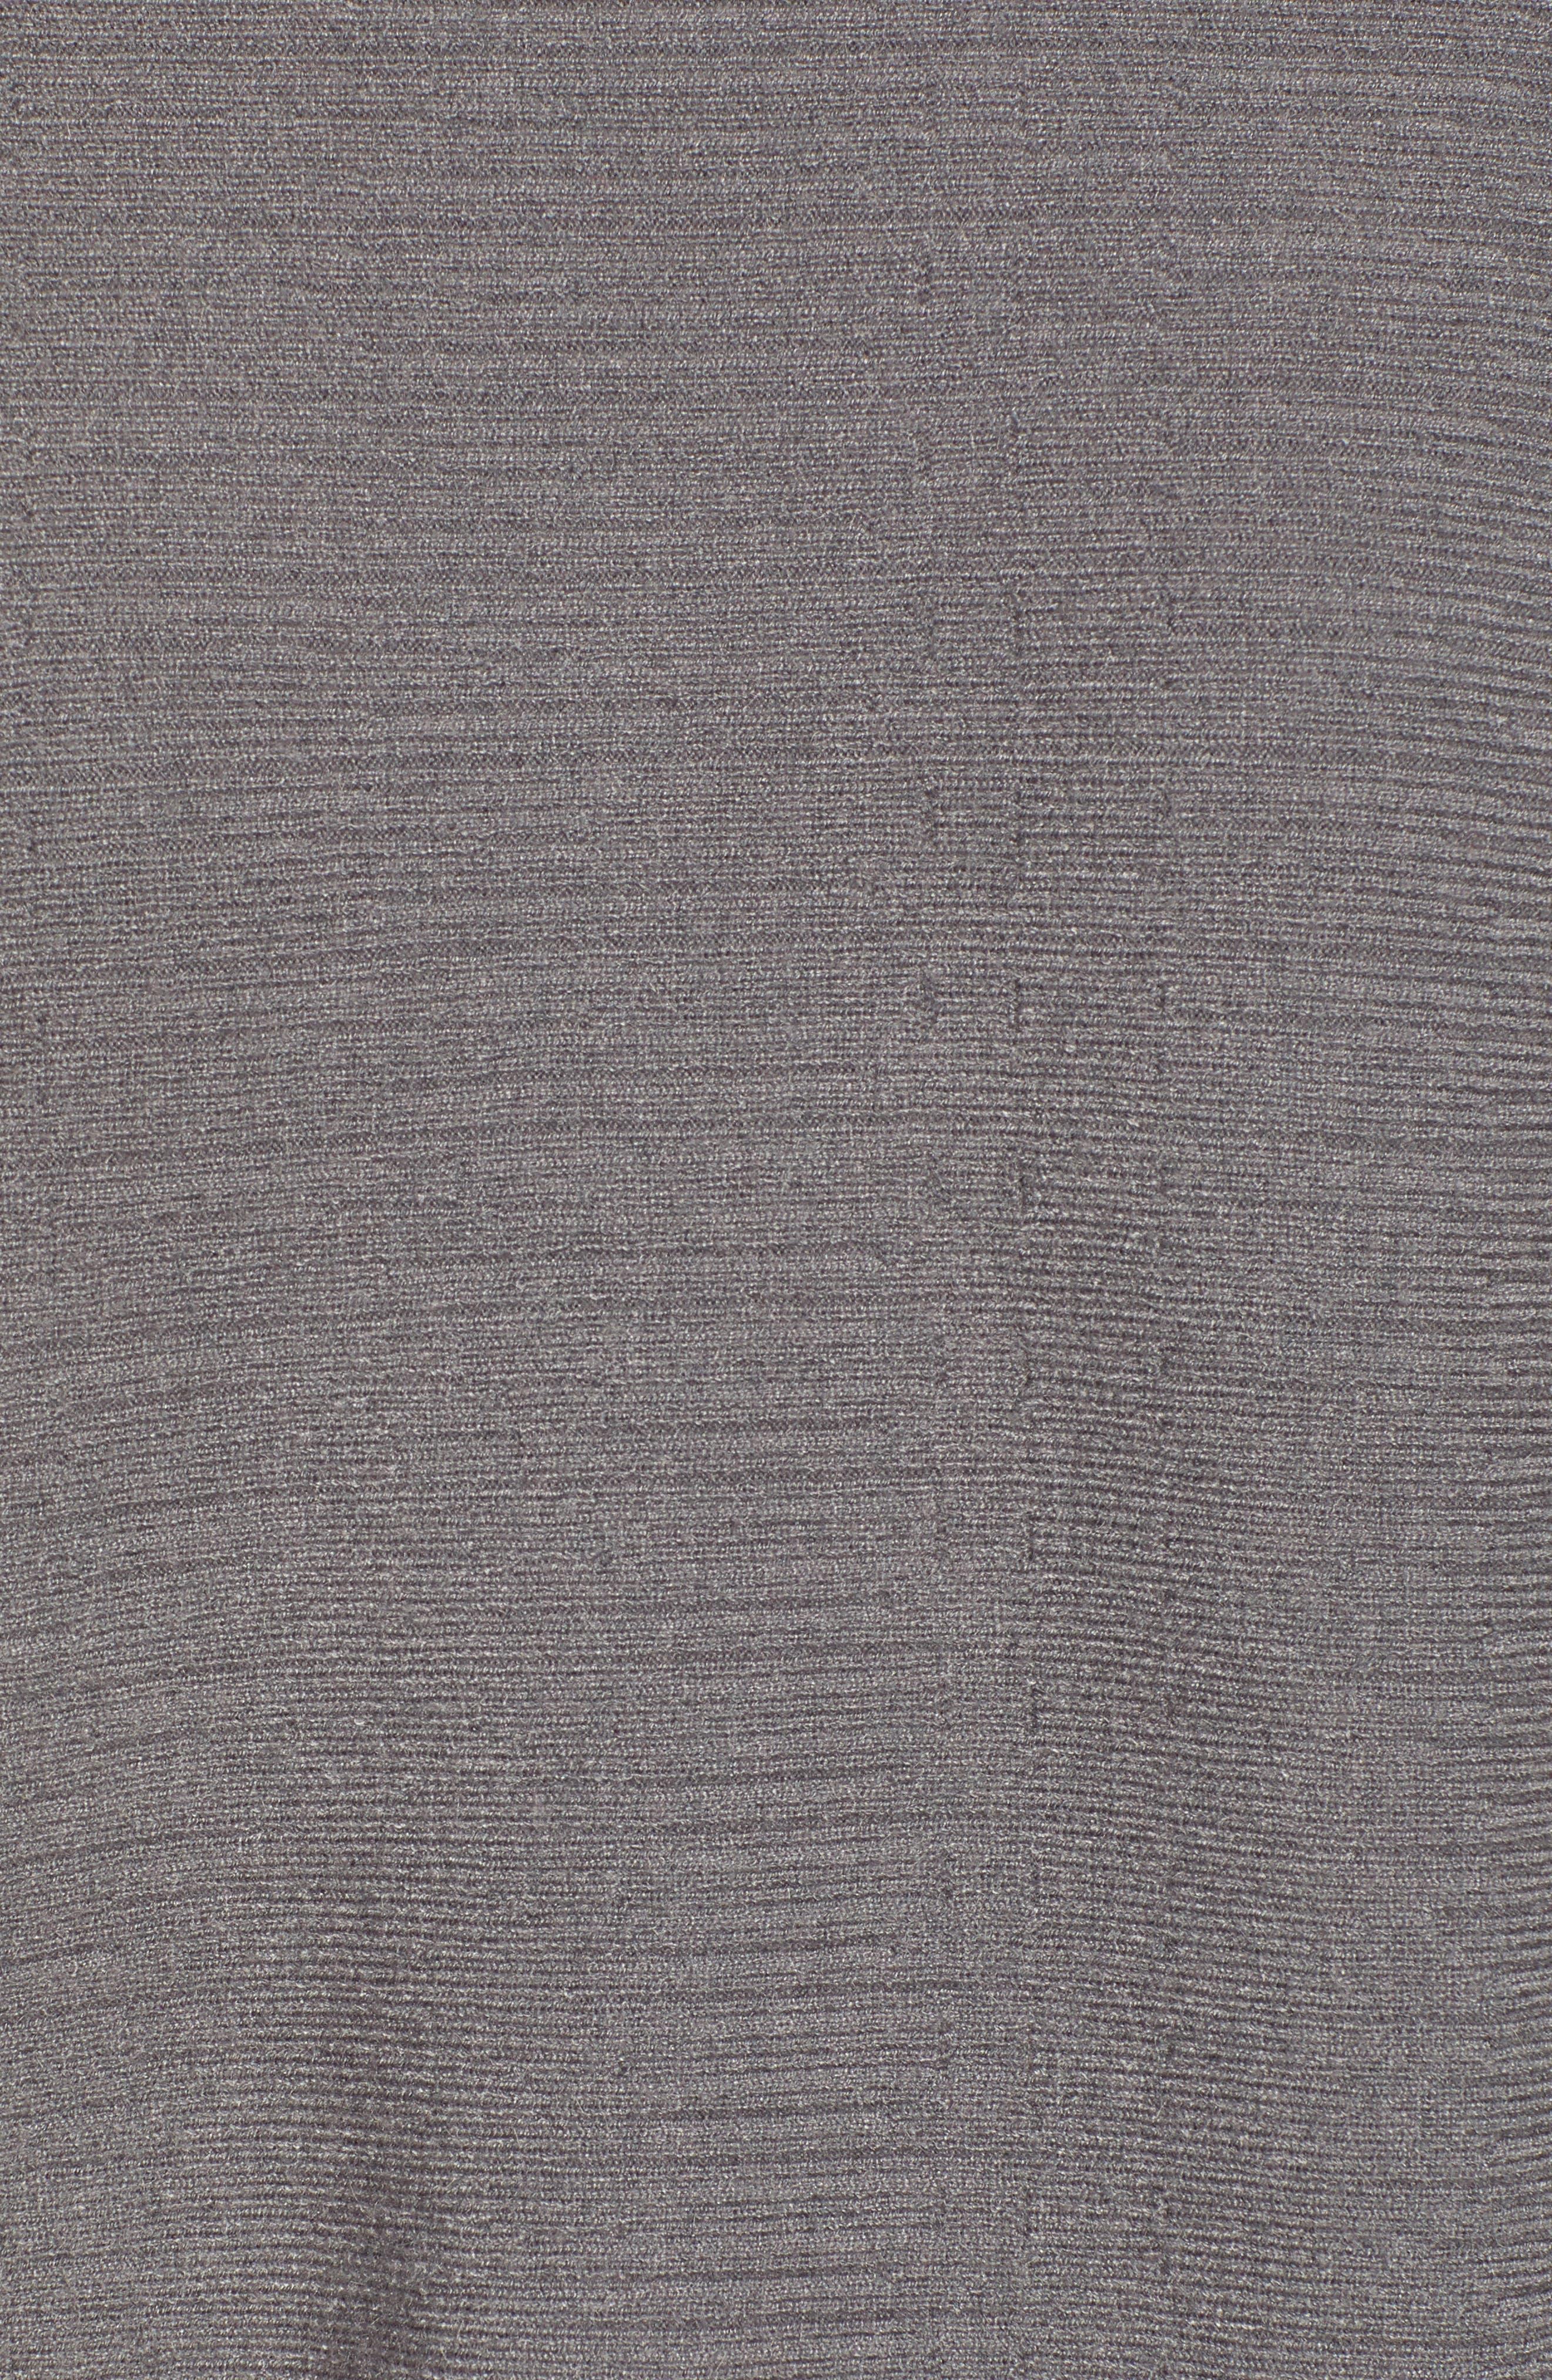 Dolman Boat Neck Sweater,                             Alternate thumbnail 5, color,                             STEEL GRAY